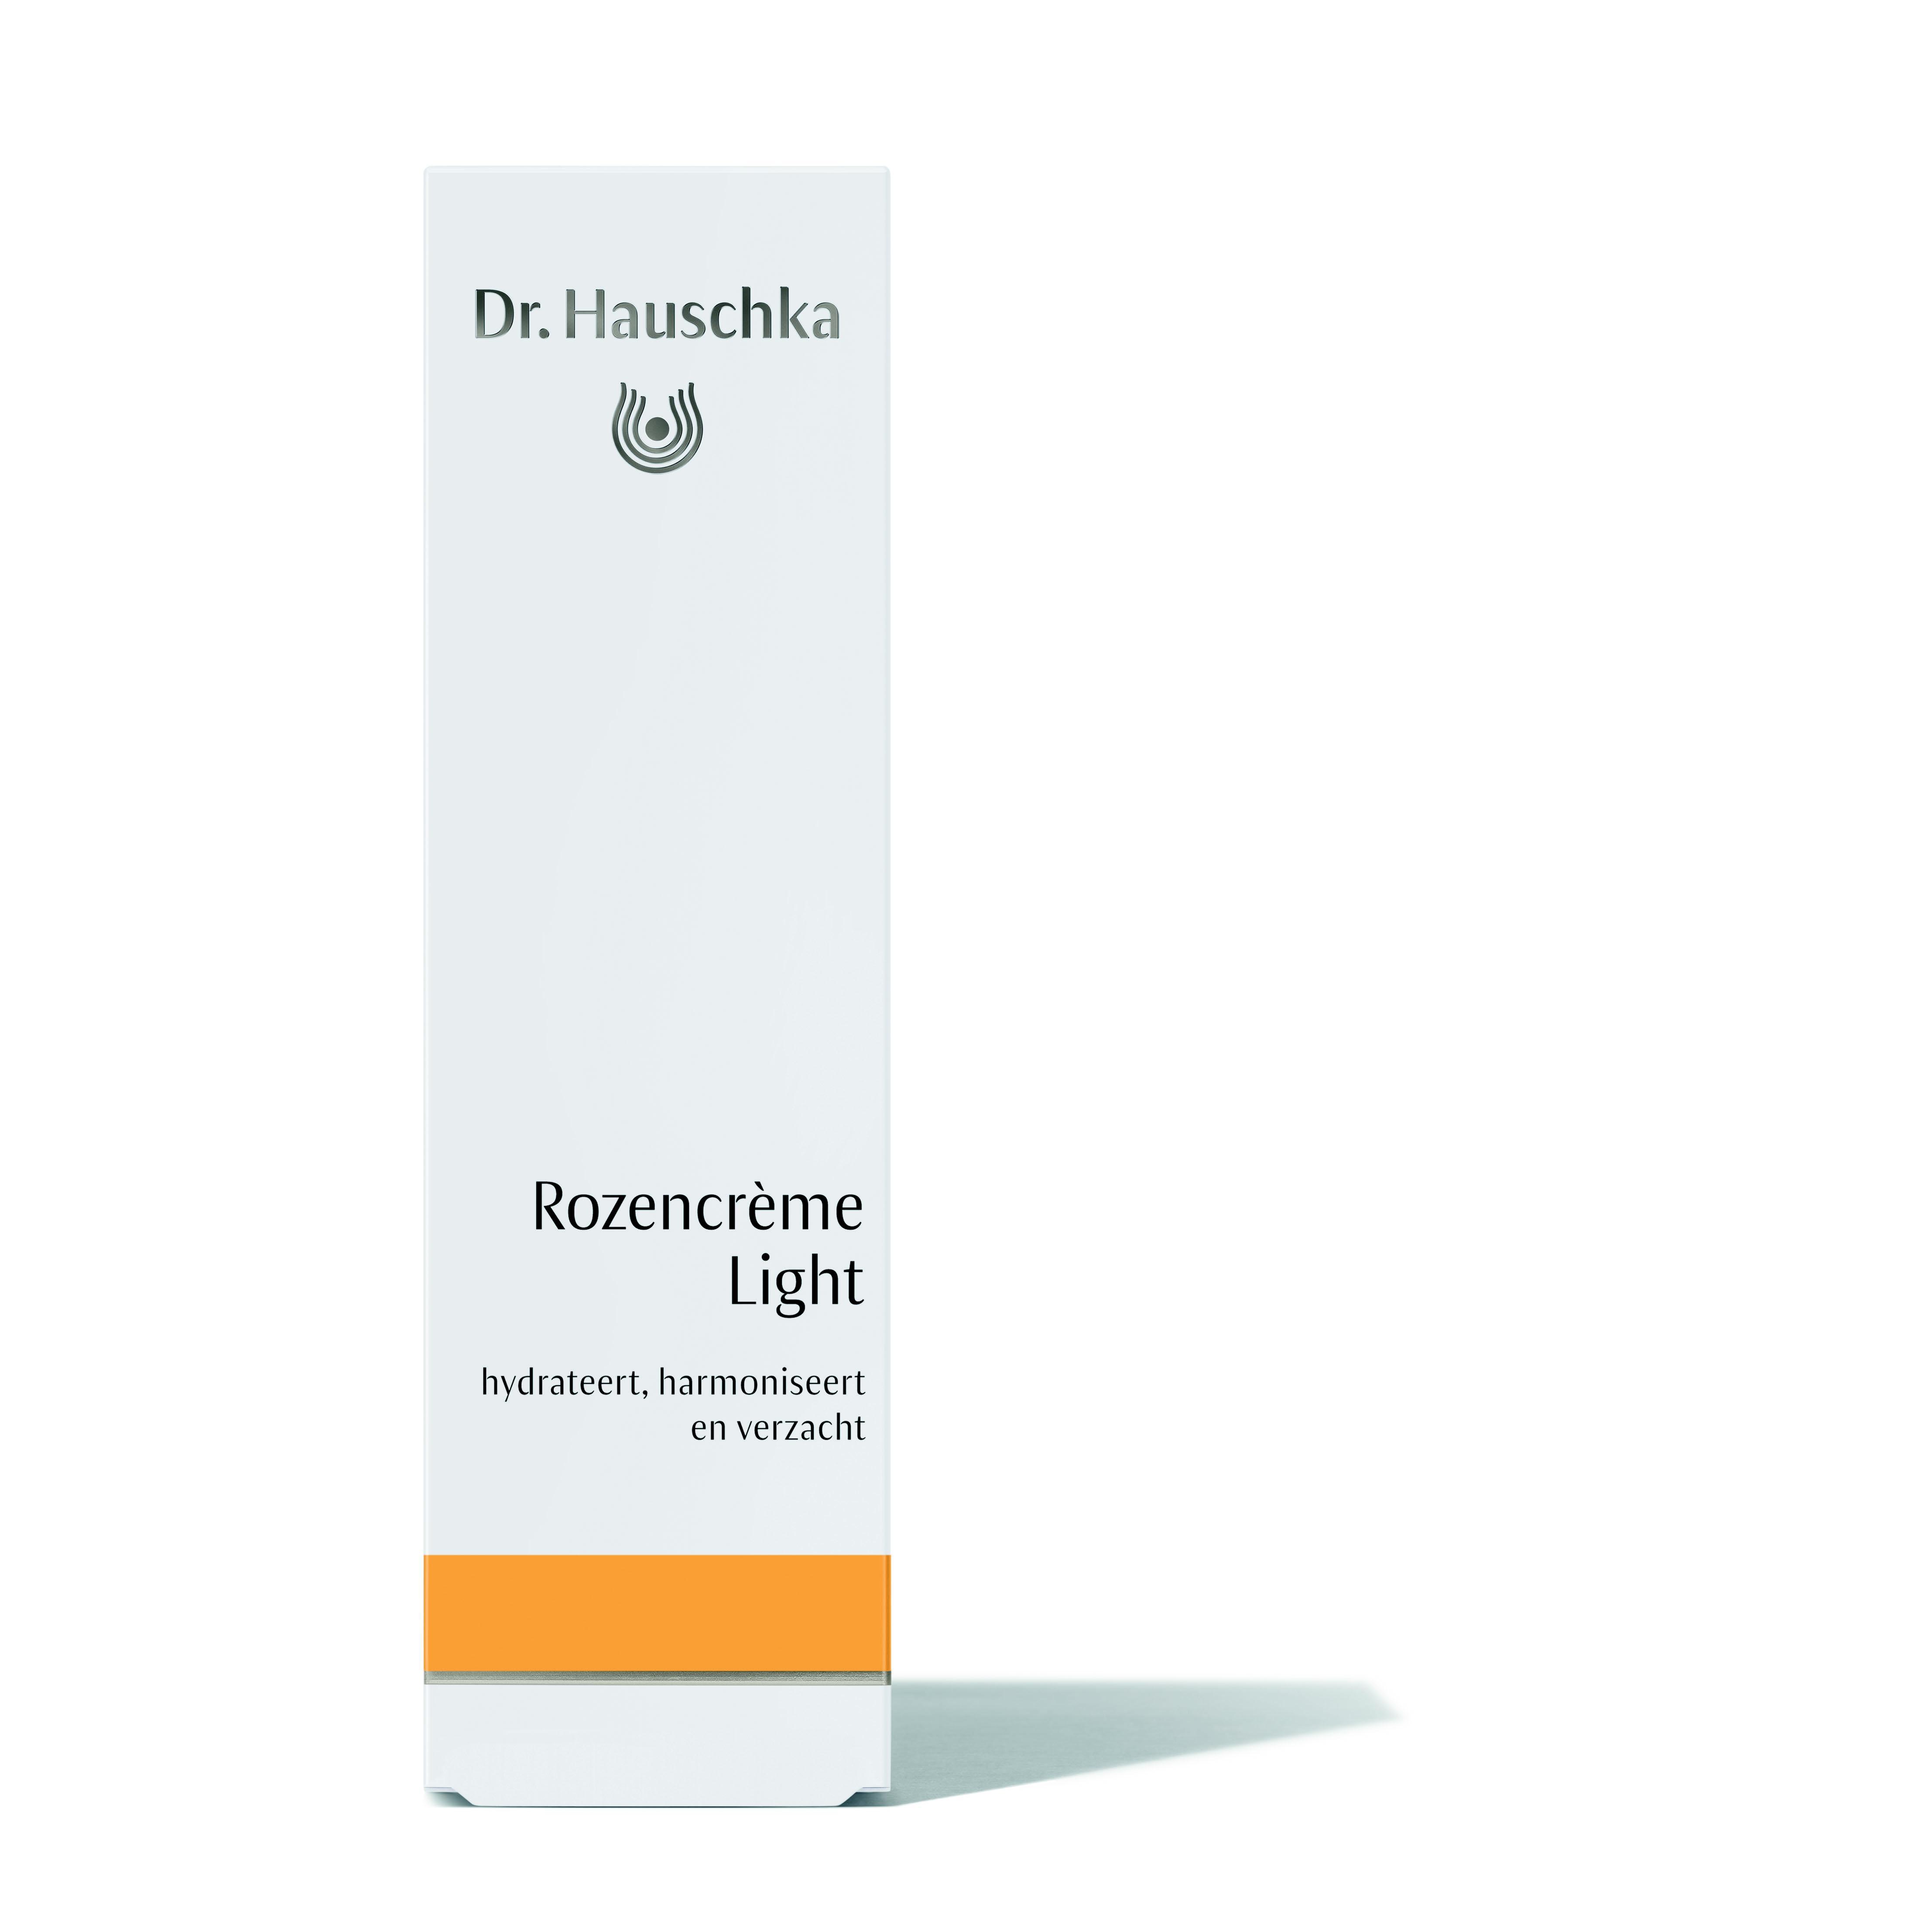 Dr Hauschka Rozencreme Light 30 gram